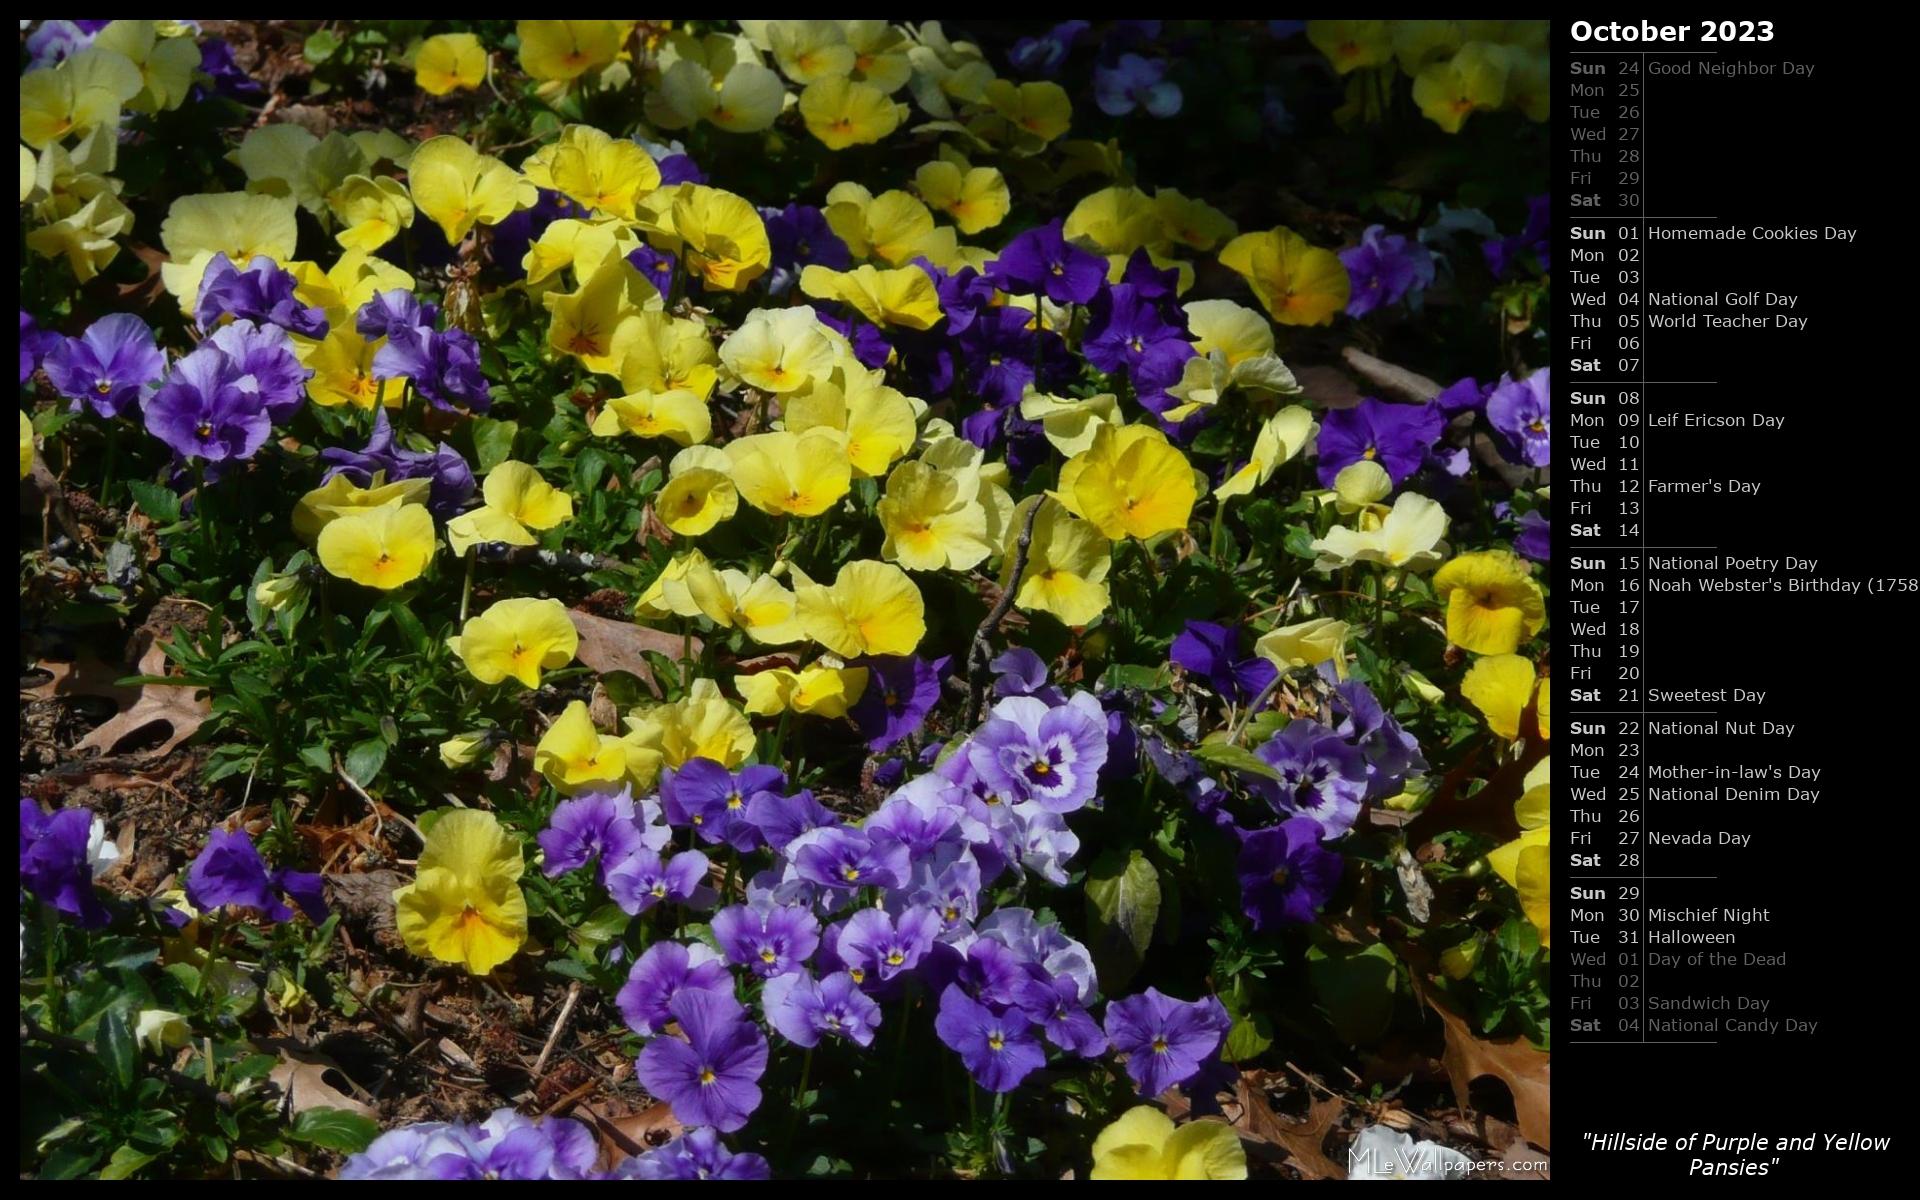 Mlewallpapers Hillside Of Purple And Yellow Pansies Calendar